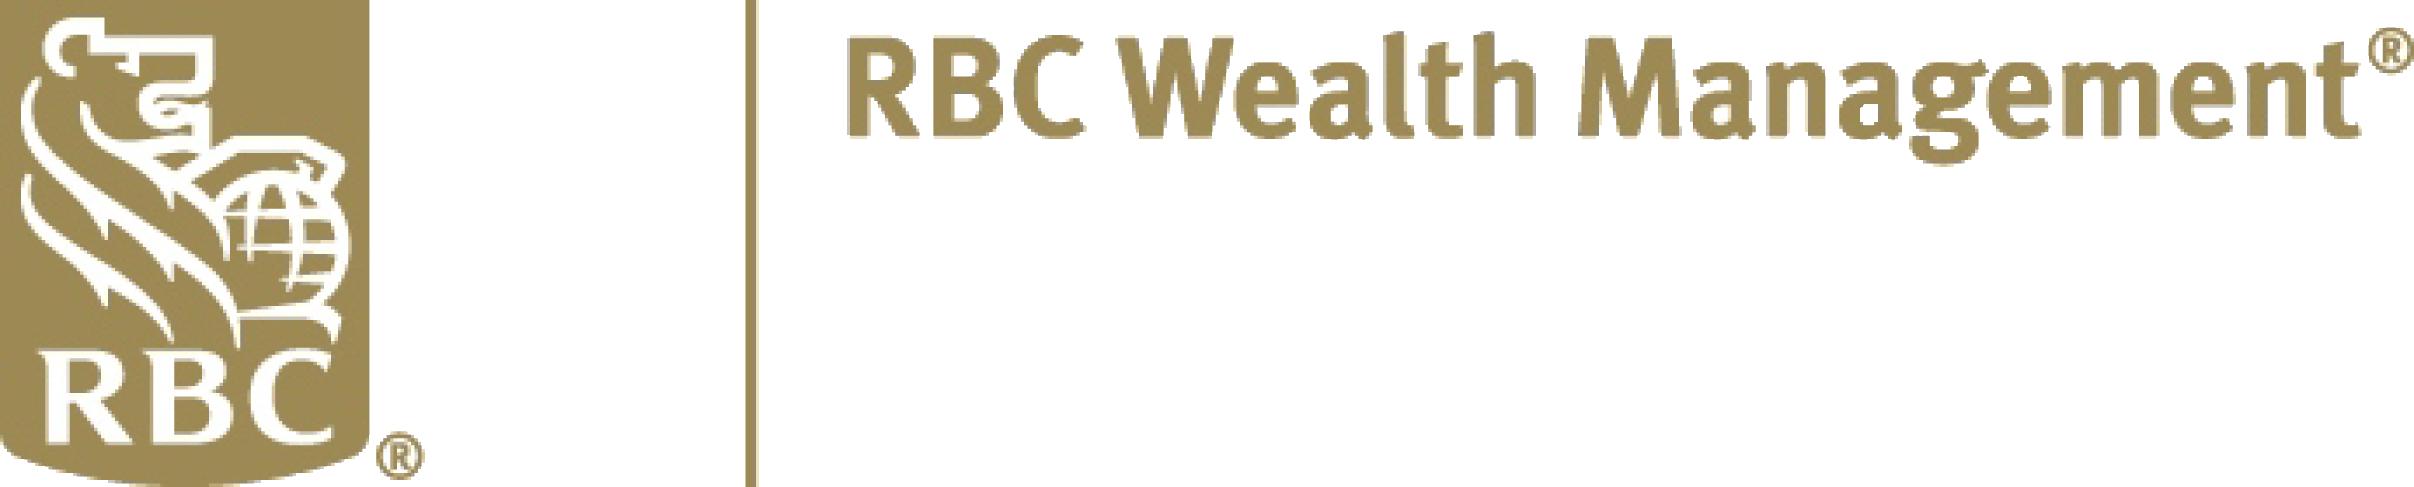 RBC Logo.png